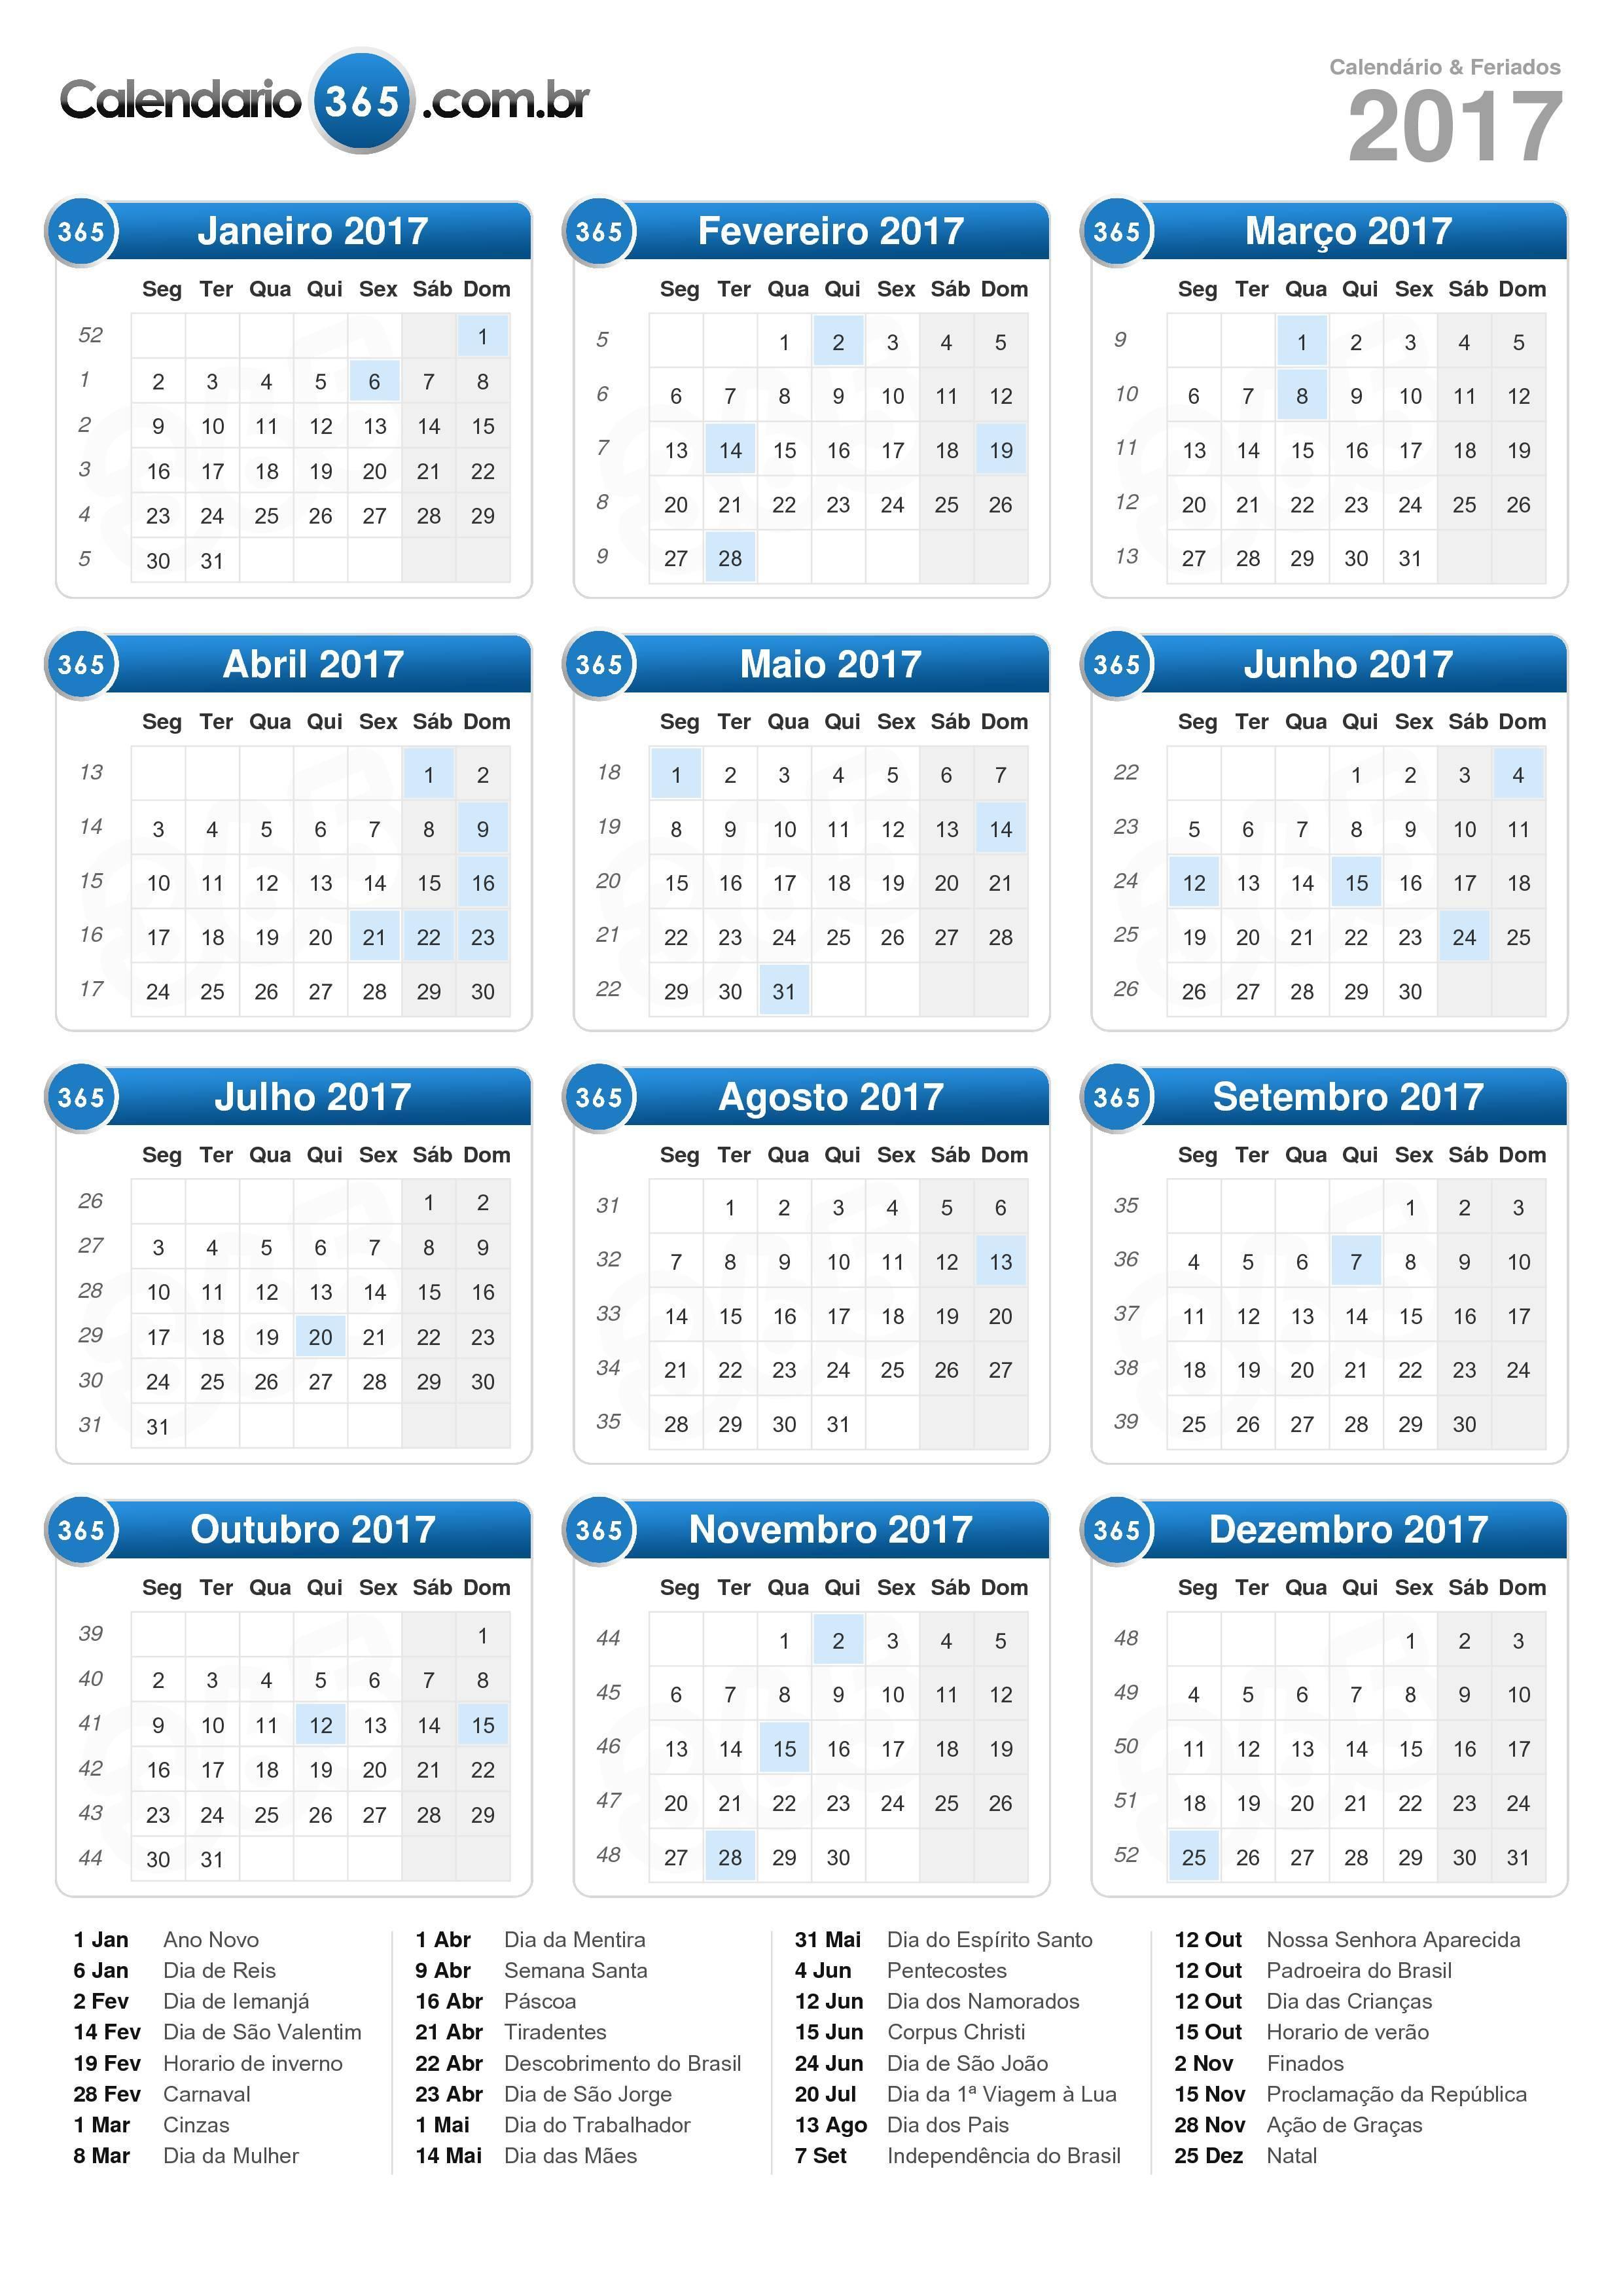 Nz Calendar Of National Days Rak Day Random Acts Of Kindness Day New Zealand Calend225;rio 2017